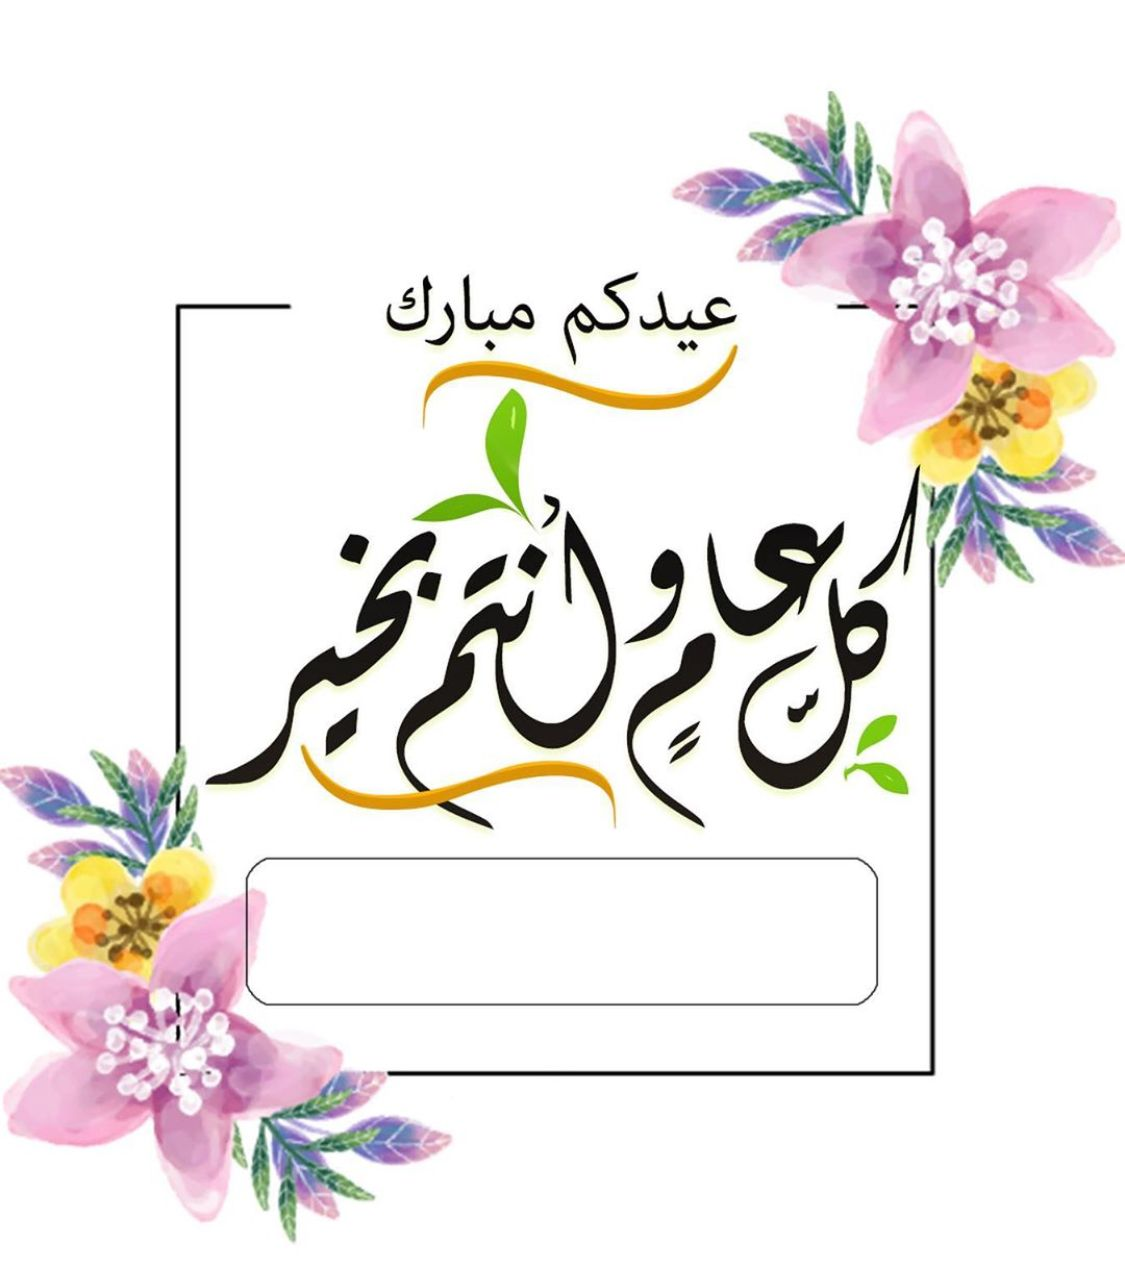 Pin By Youyou Ahmed On عيد الفطر عيد الأضحى Eid Mubark Eid Stickers Eid Greetings Eid Cards